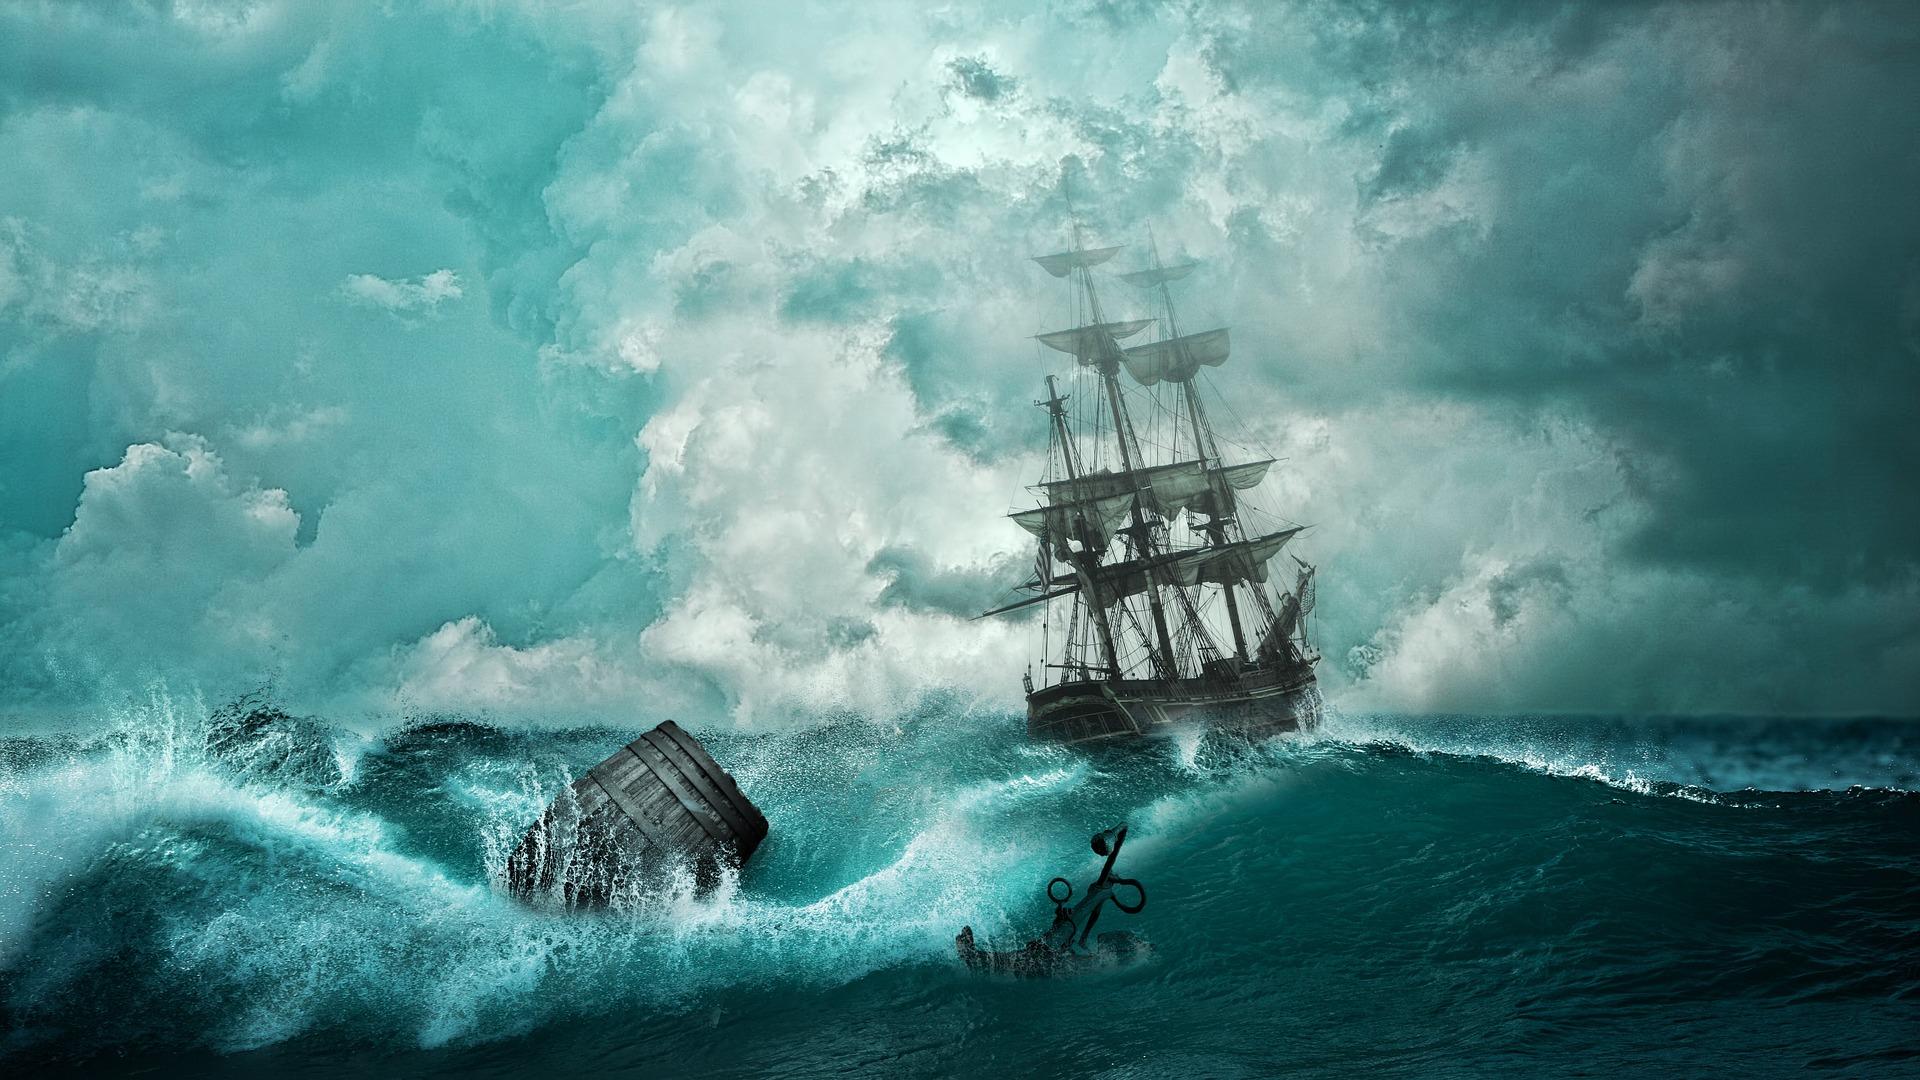 nave, anjo, barco, Mar, Aventura, Tempest, Anchor - Papéis de parede HD - Professor-falken.com